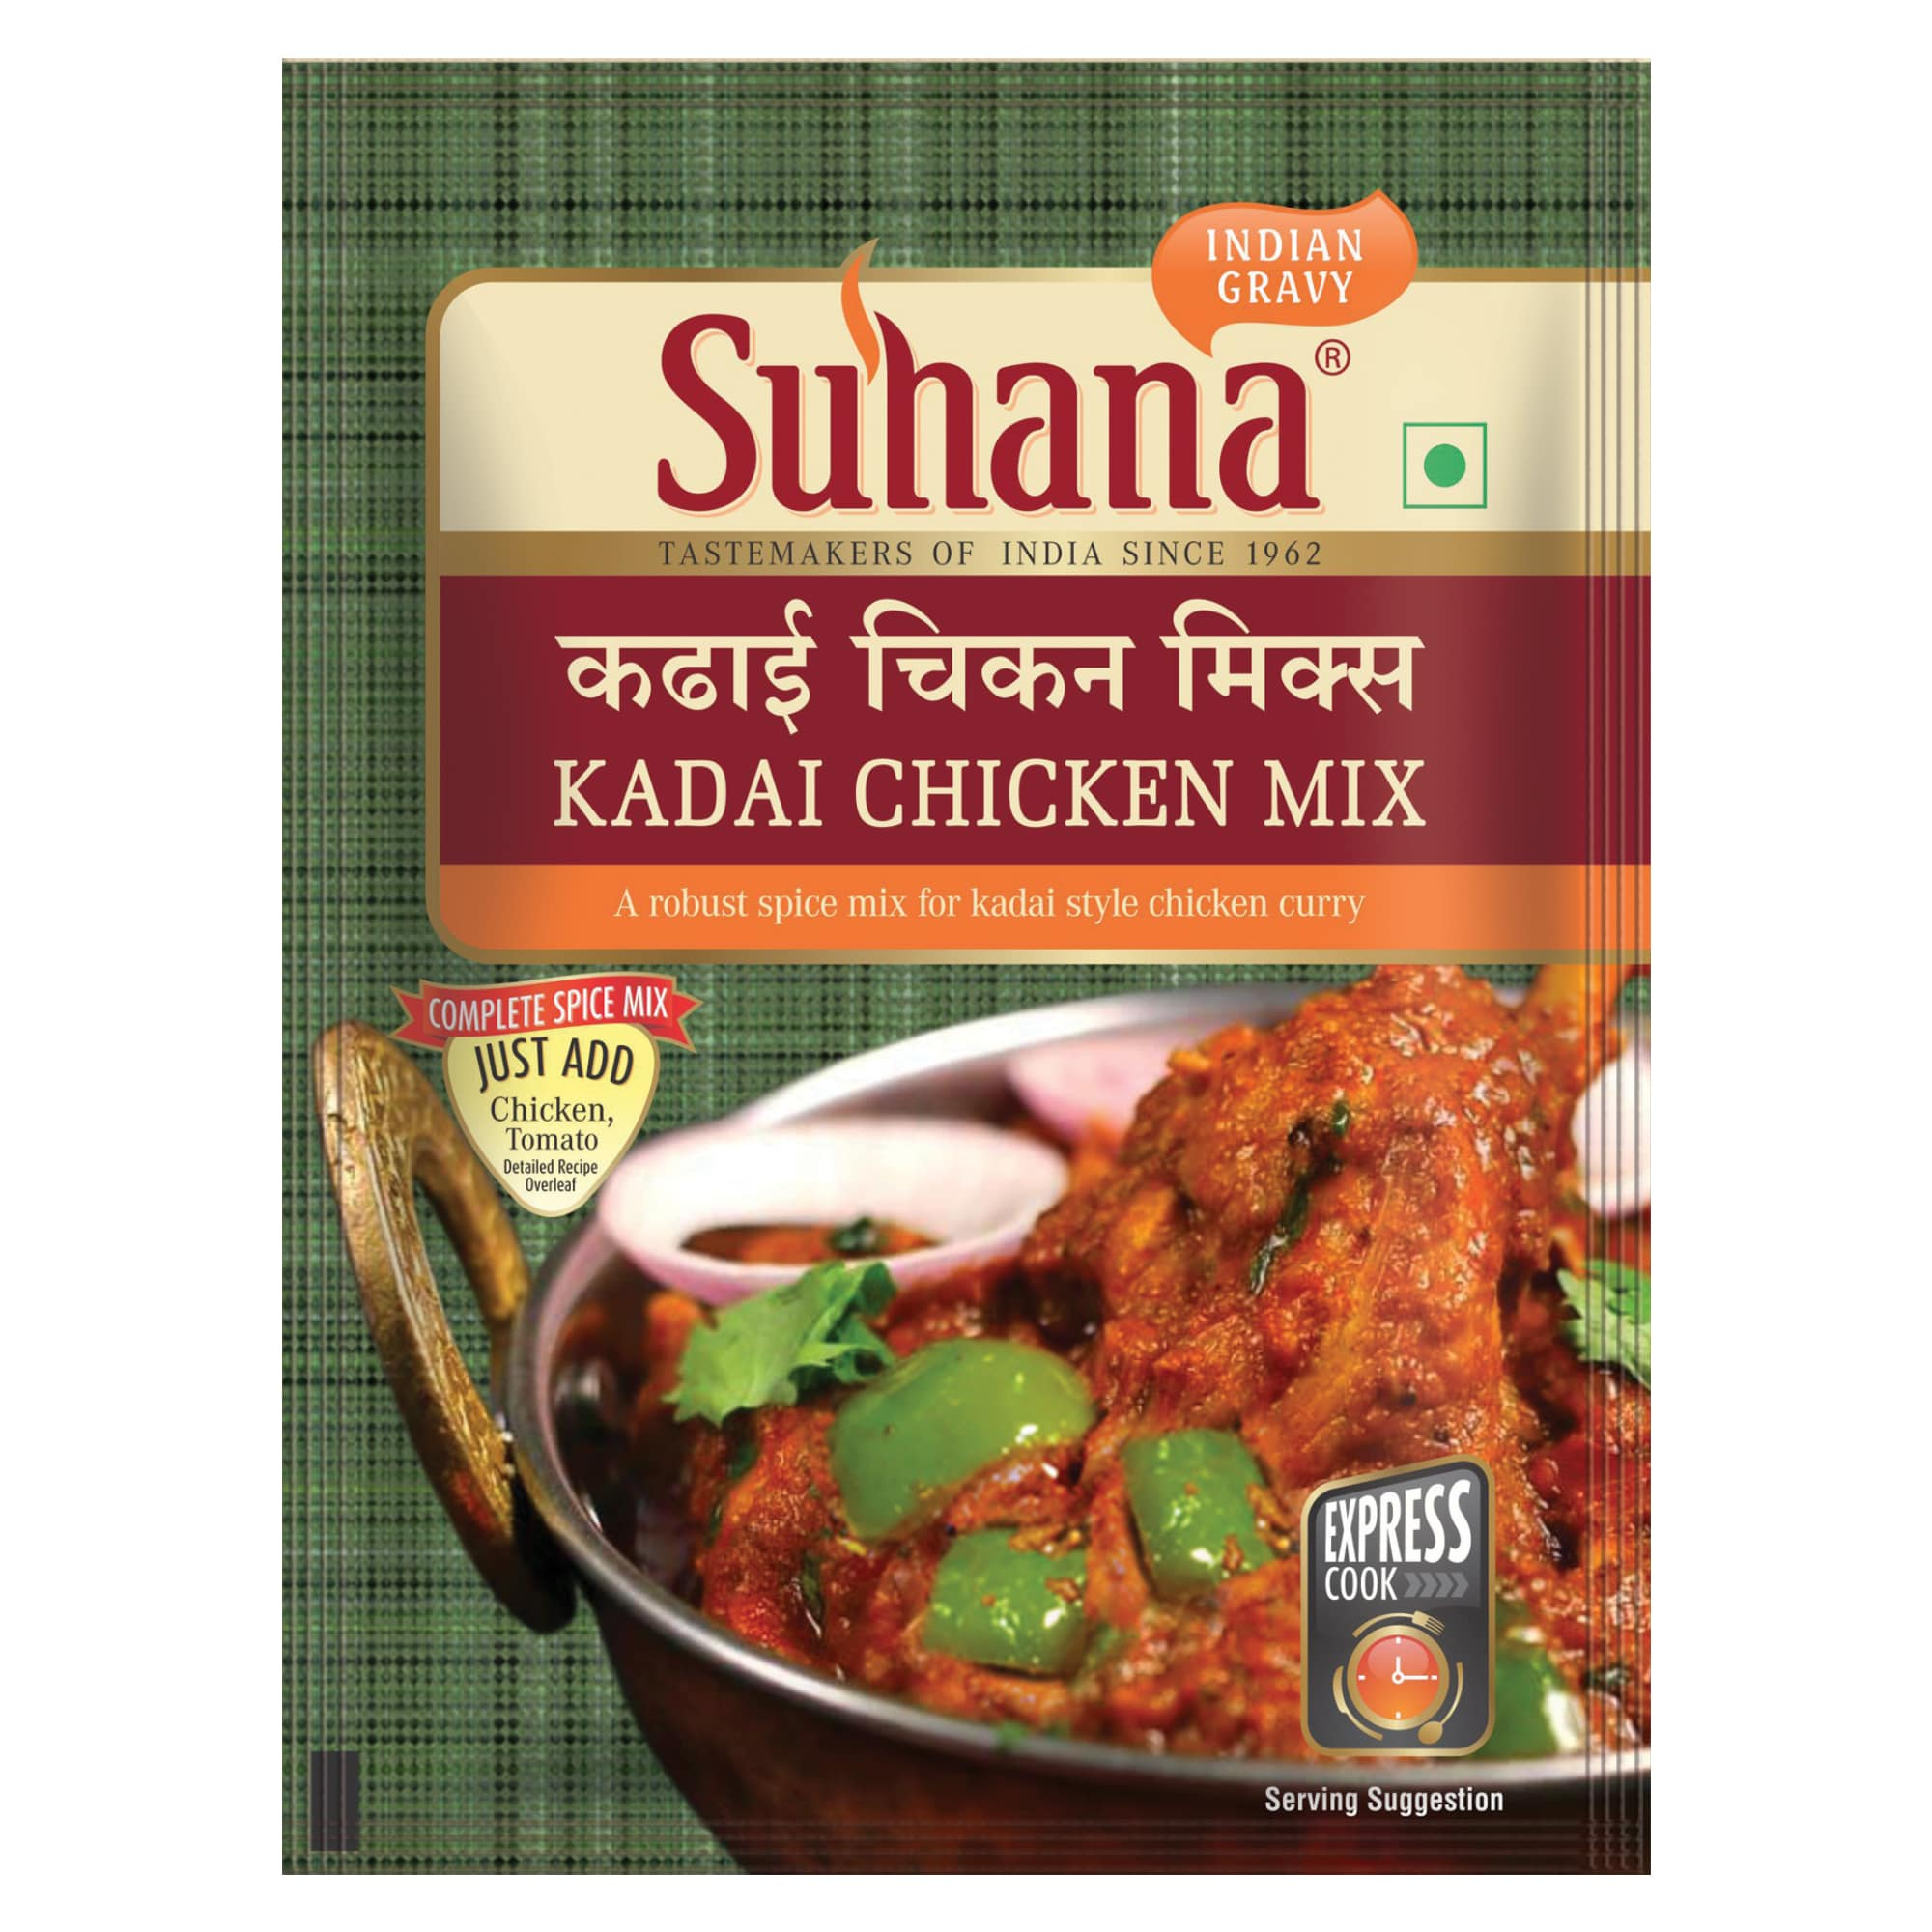 Suhana Kadai Chicken Spice Mix 50g Pouch